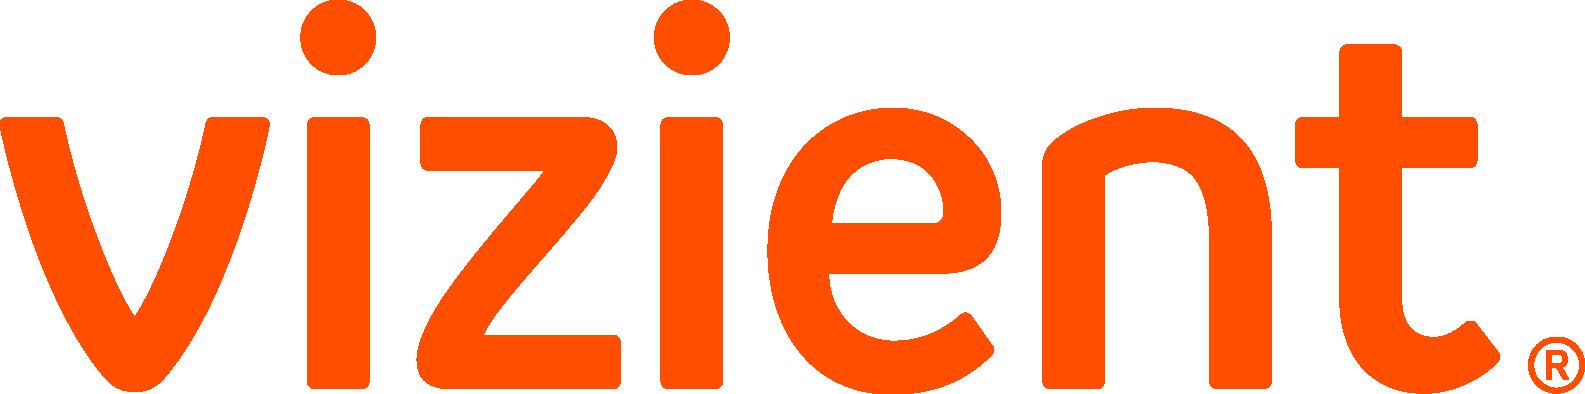 Vizient Logo Orange.png